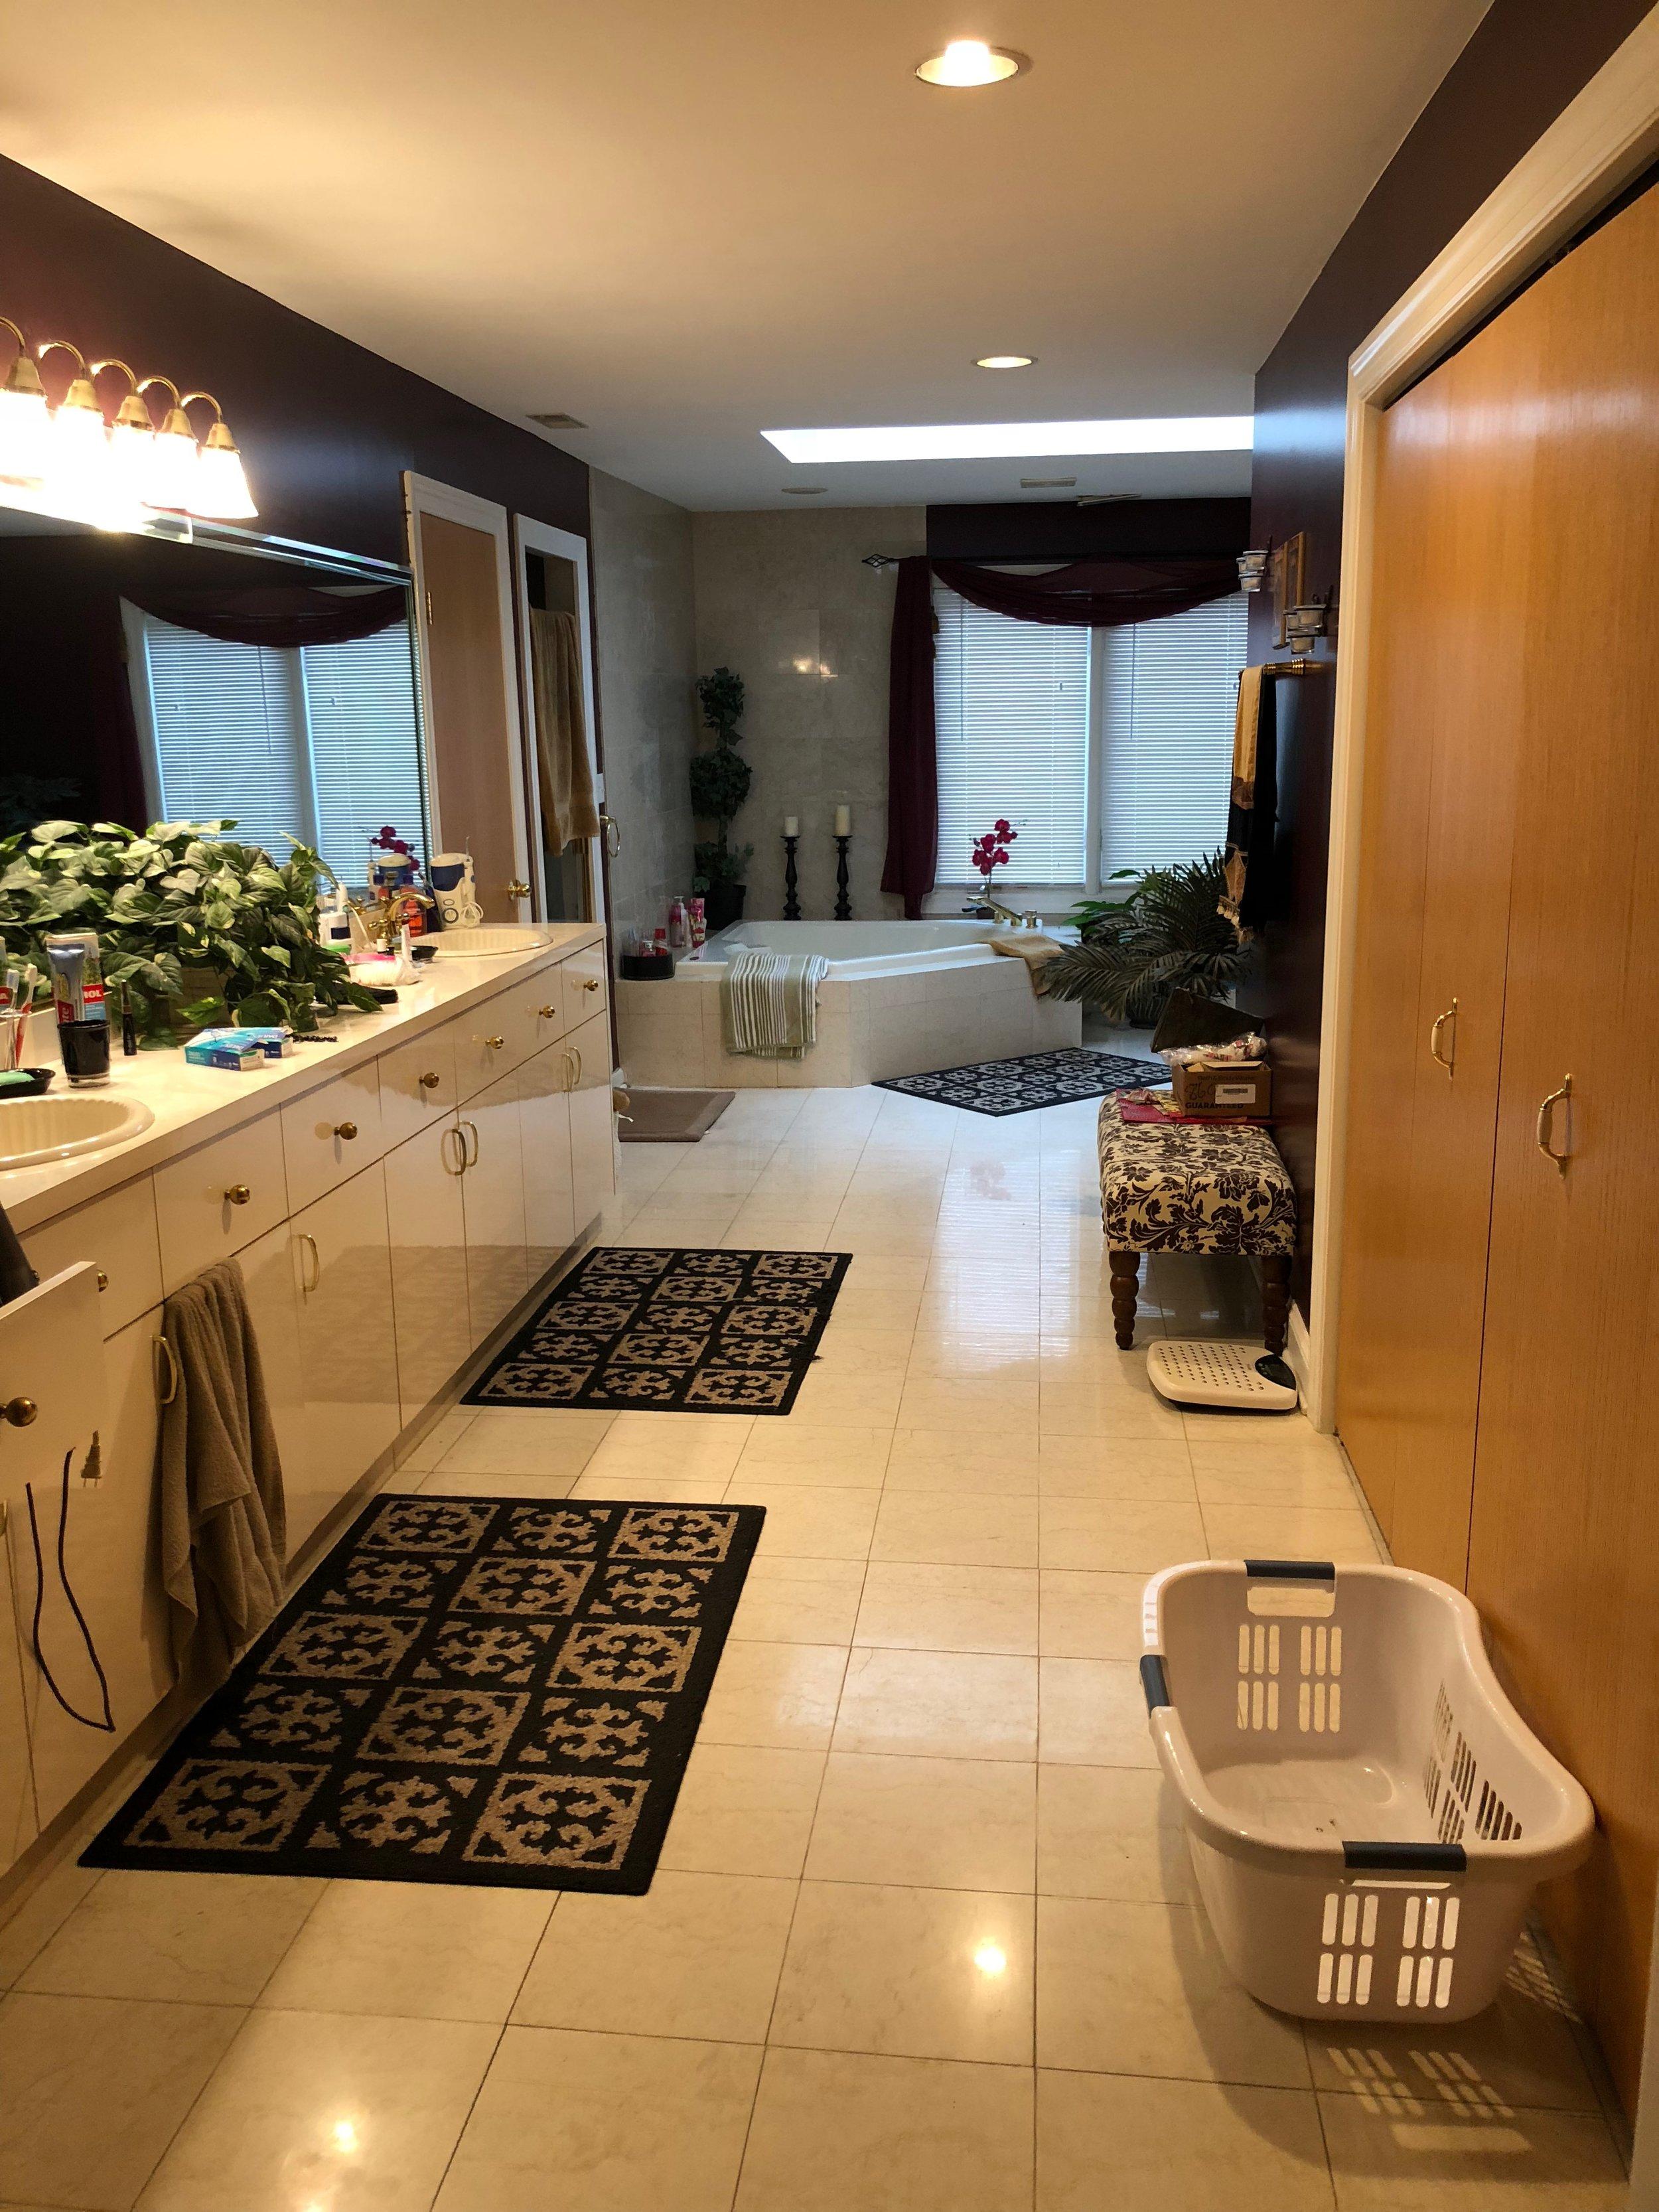 BEFORE Photo of Bathroom Remodel in Eagle Brook Subdivision, Geneva IL.